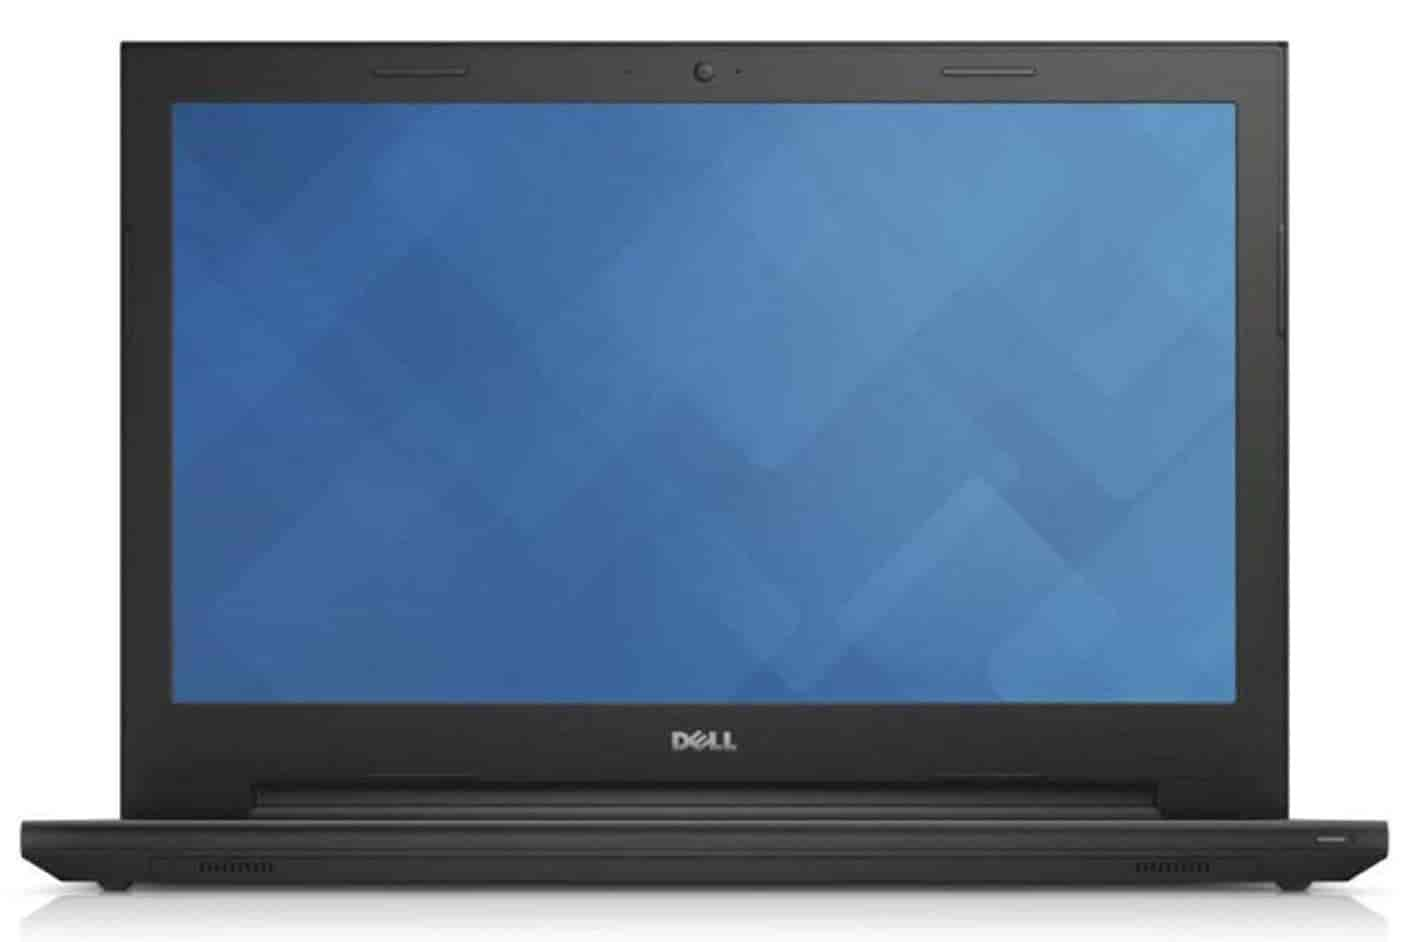 Dell-Inspiron-3543-X560334IN9-15-6-inch-Touchscreen-Laptop-(Core-i5-5200U-4GB-1TB-Windows-8-1-Nvidia-GeForce-820M-2GB-DDR3-Graphics)-Black